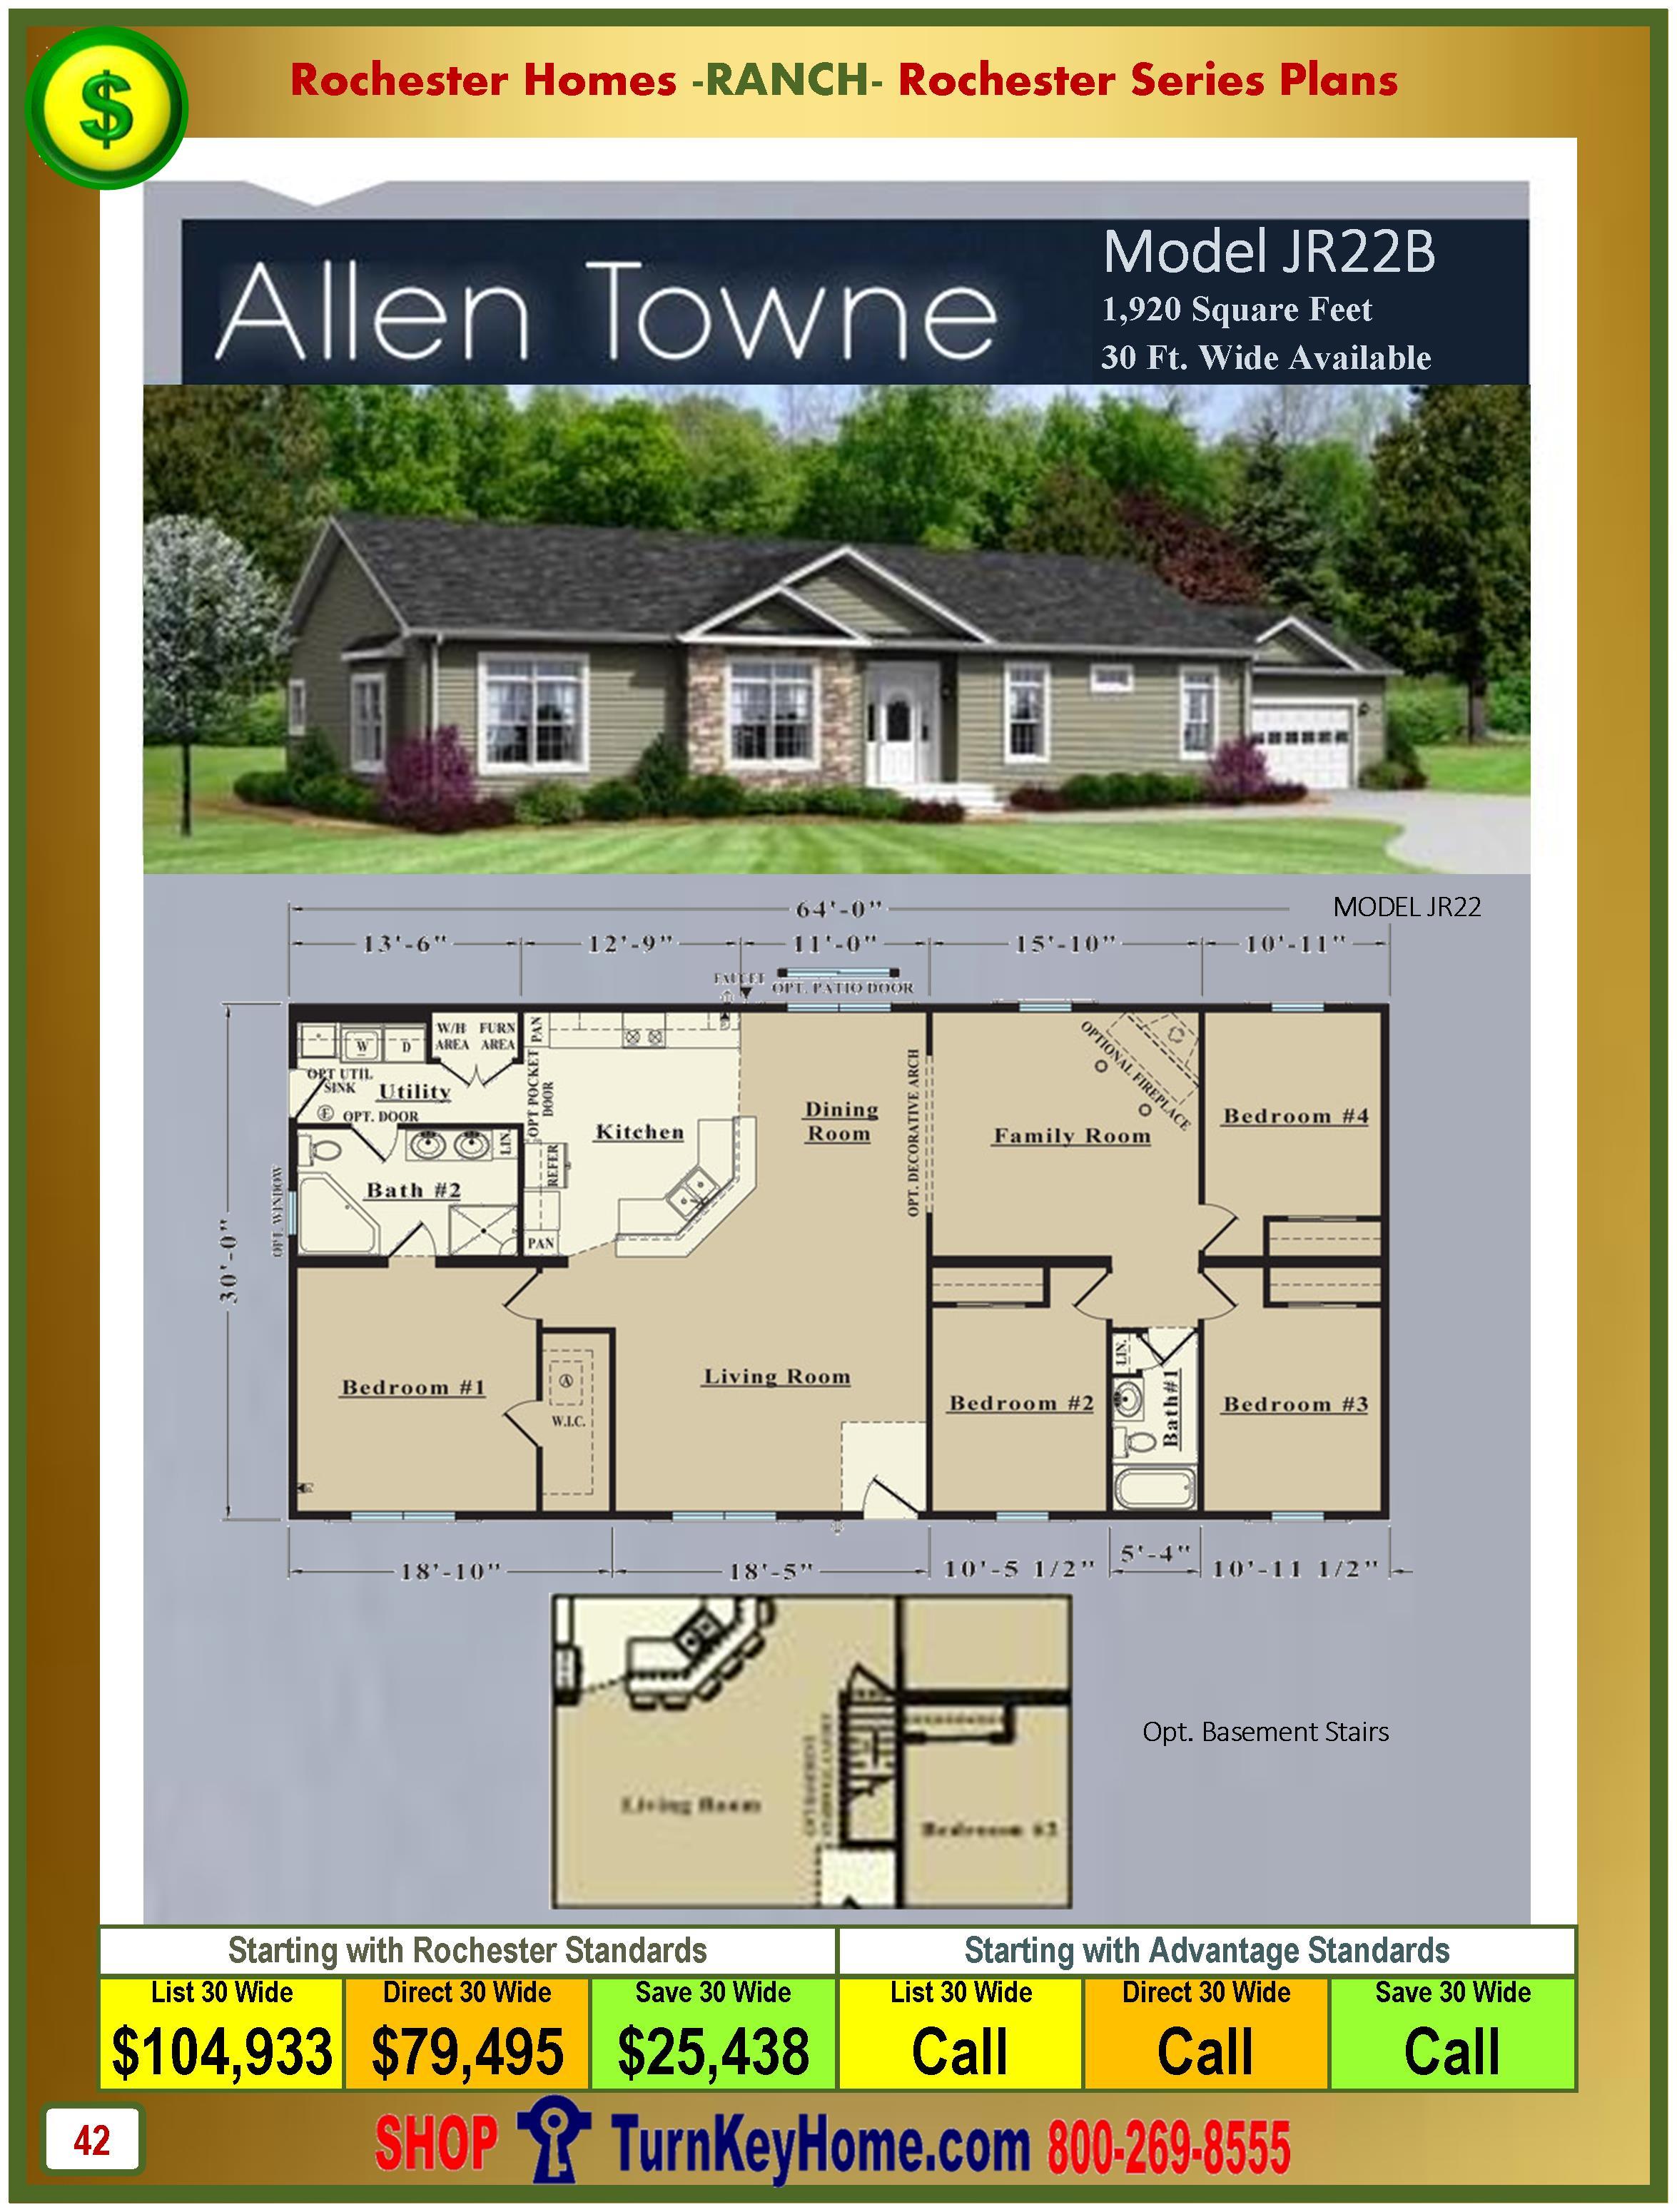 Modular.Homes.Rochester.Home.Inc.Allen.Towne.JR22B.Ranch.Plan.Price.Catalog.P42.1215